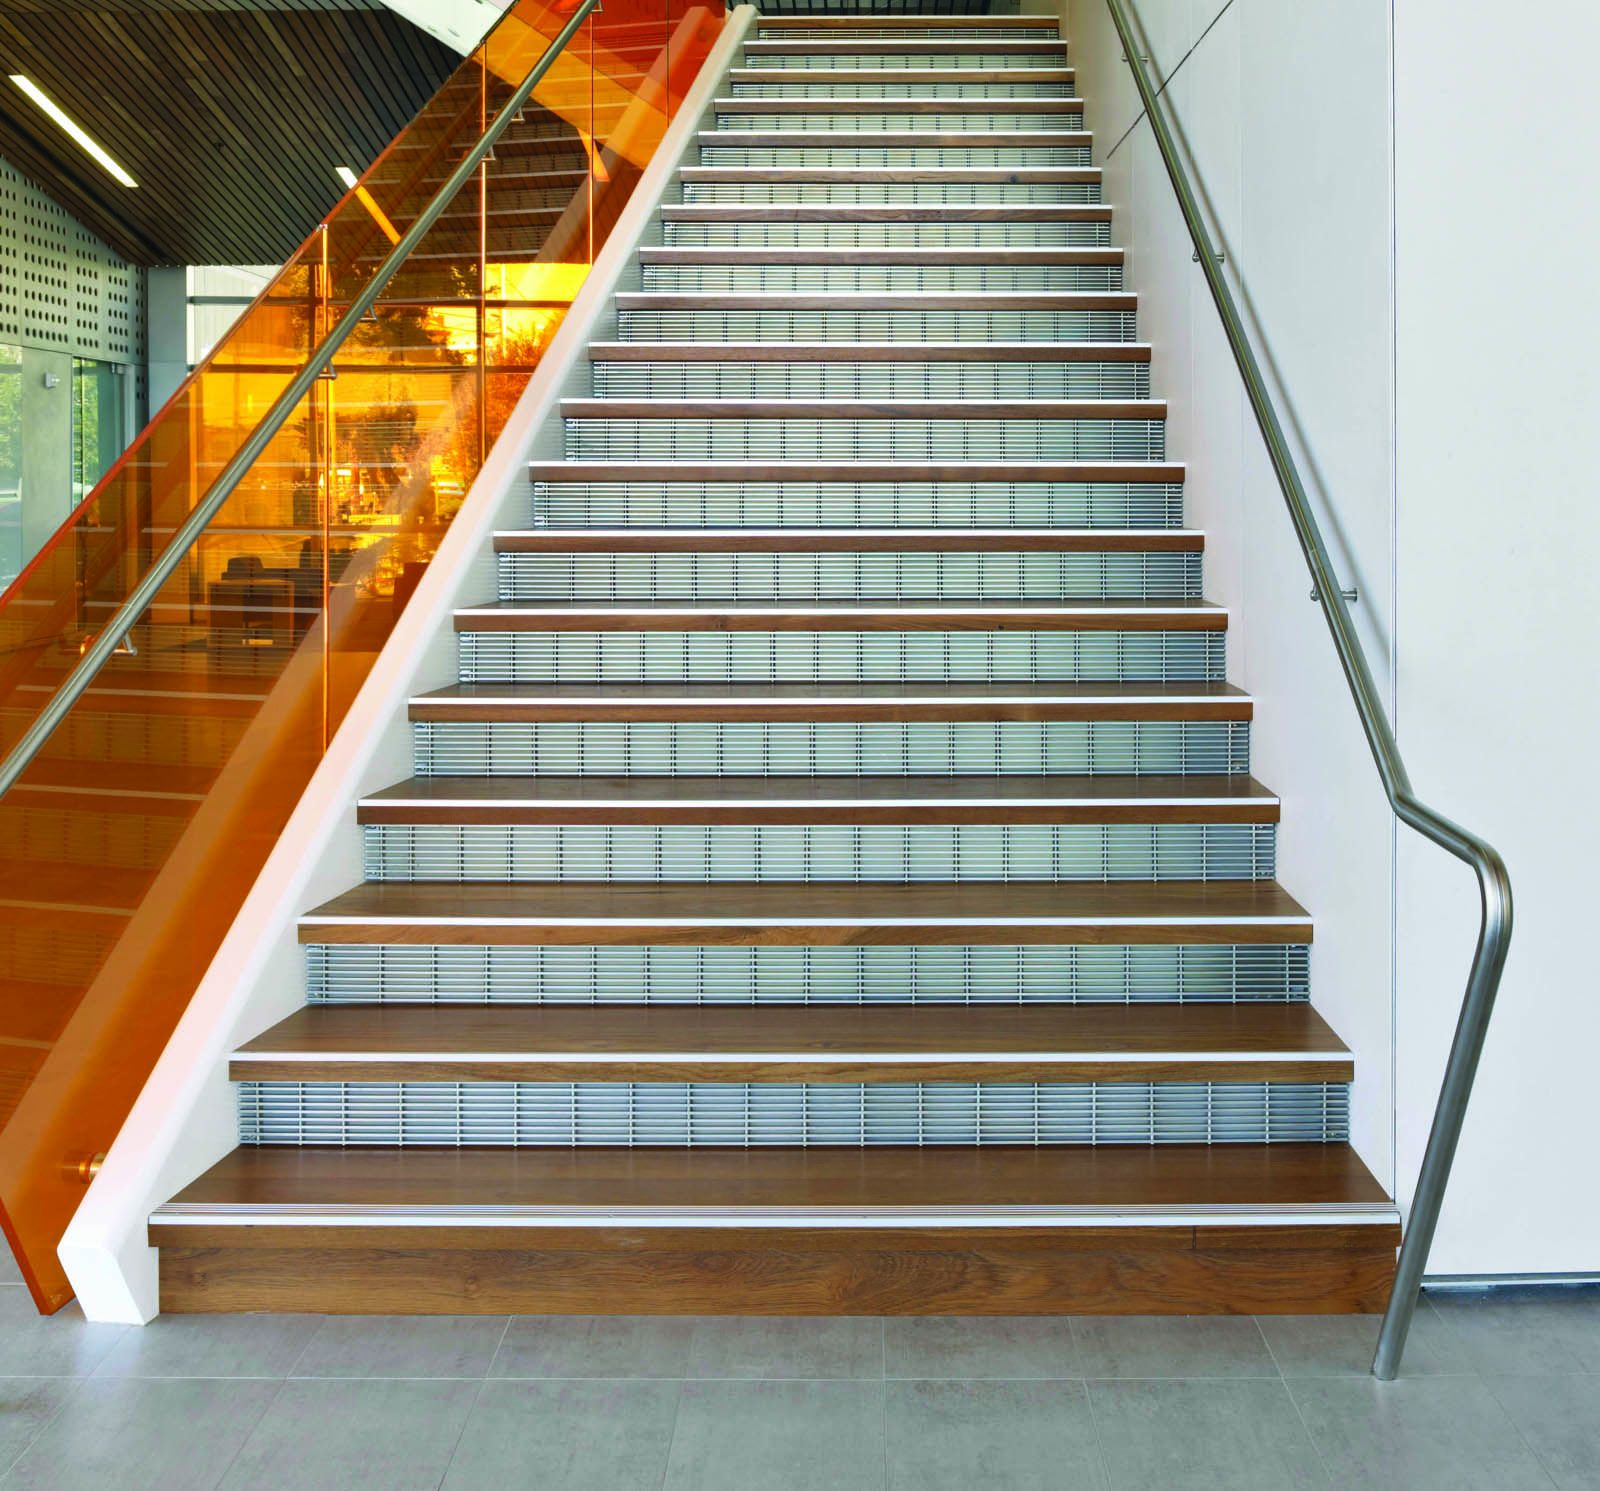 Metal Stair Treads Risers Perforated Metal Stair Panels